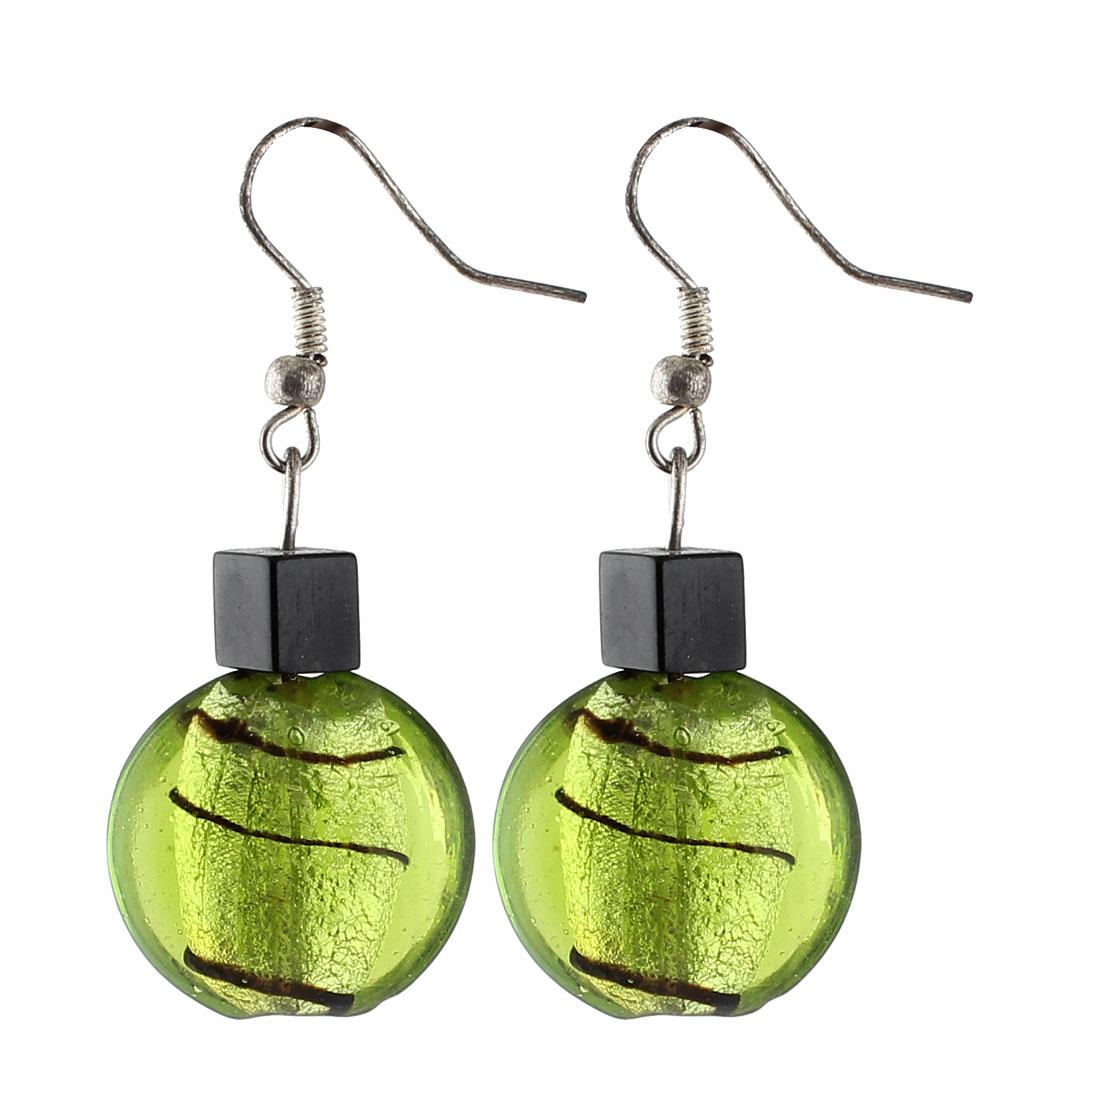 Woman Plastic Inner Lines Pattern Square Bead Dangling Pendant Hook Earrings Green Pair